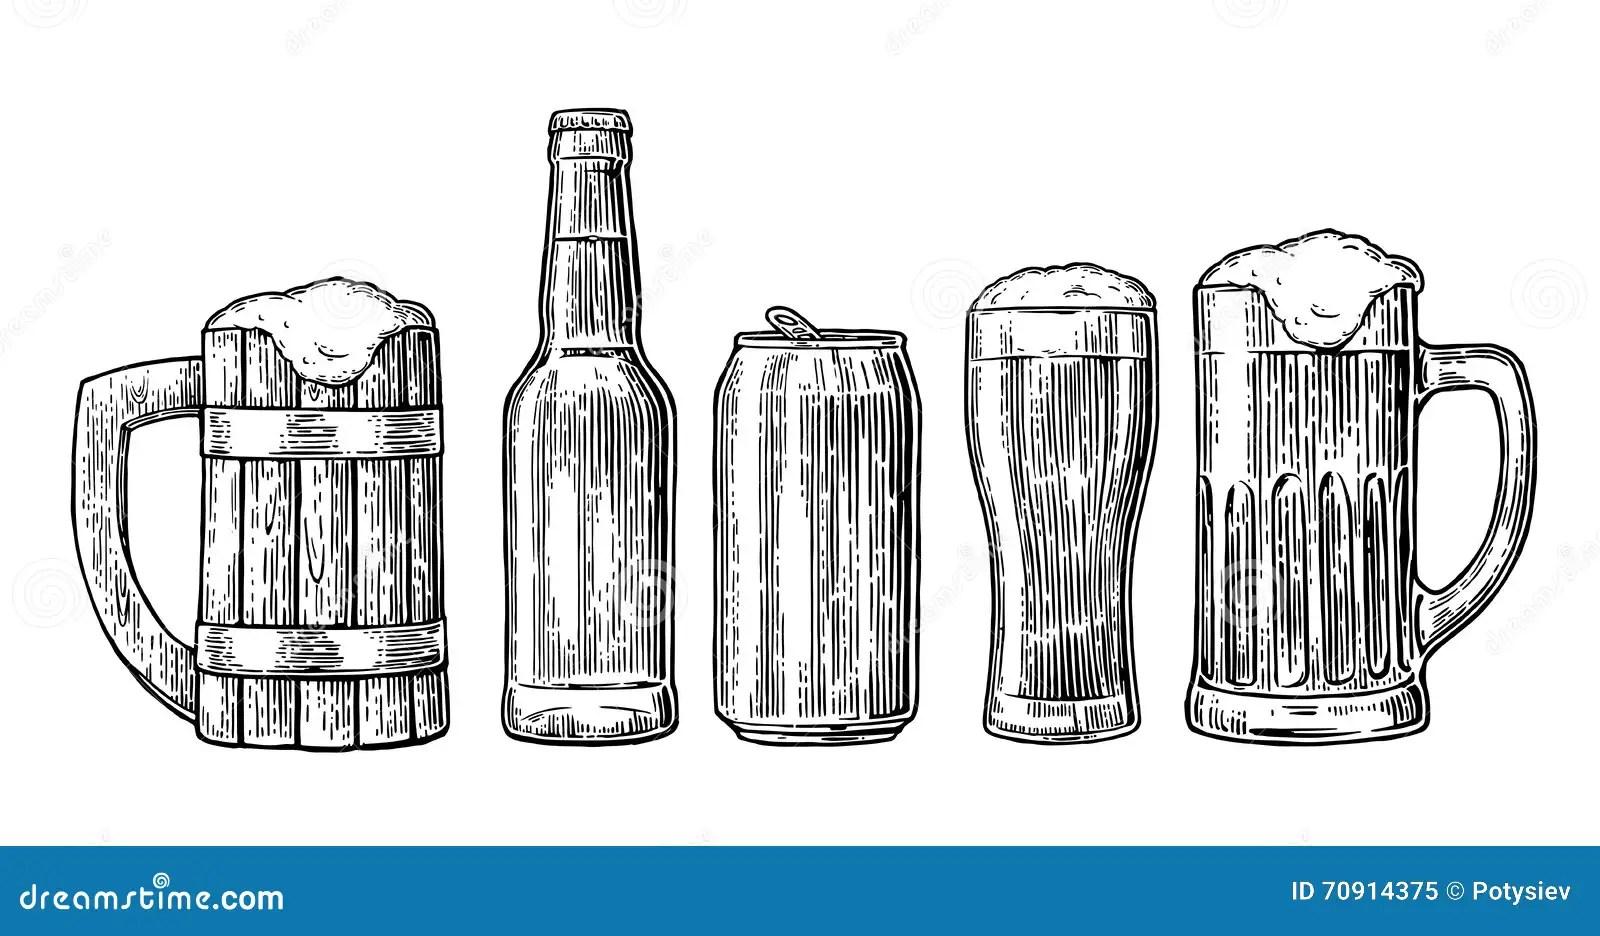 Beer Mug And Bottle On White Background Royalty Free Stock